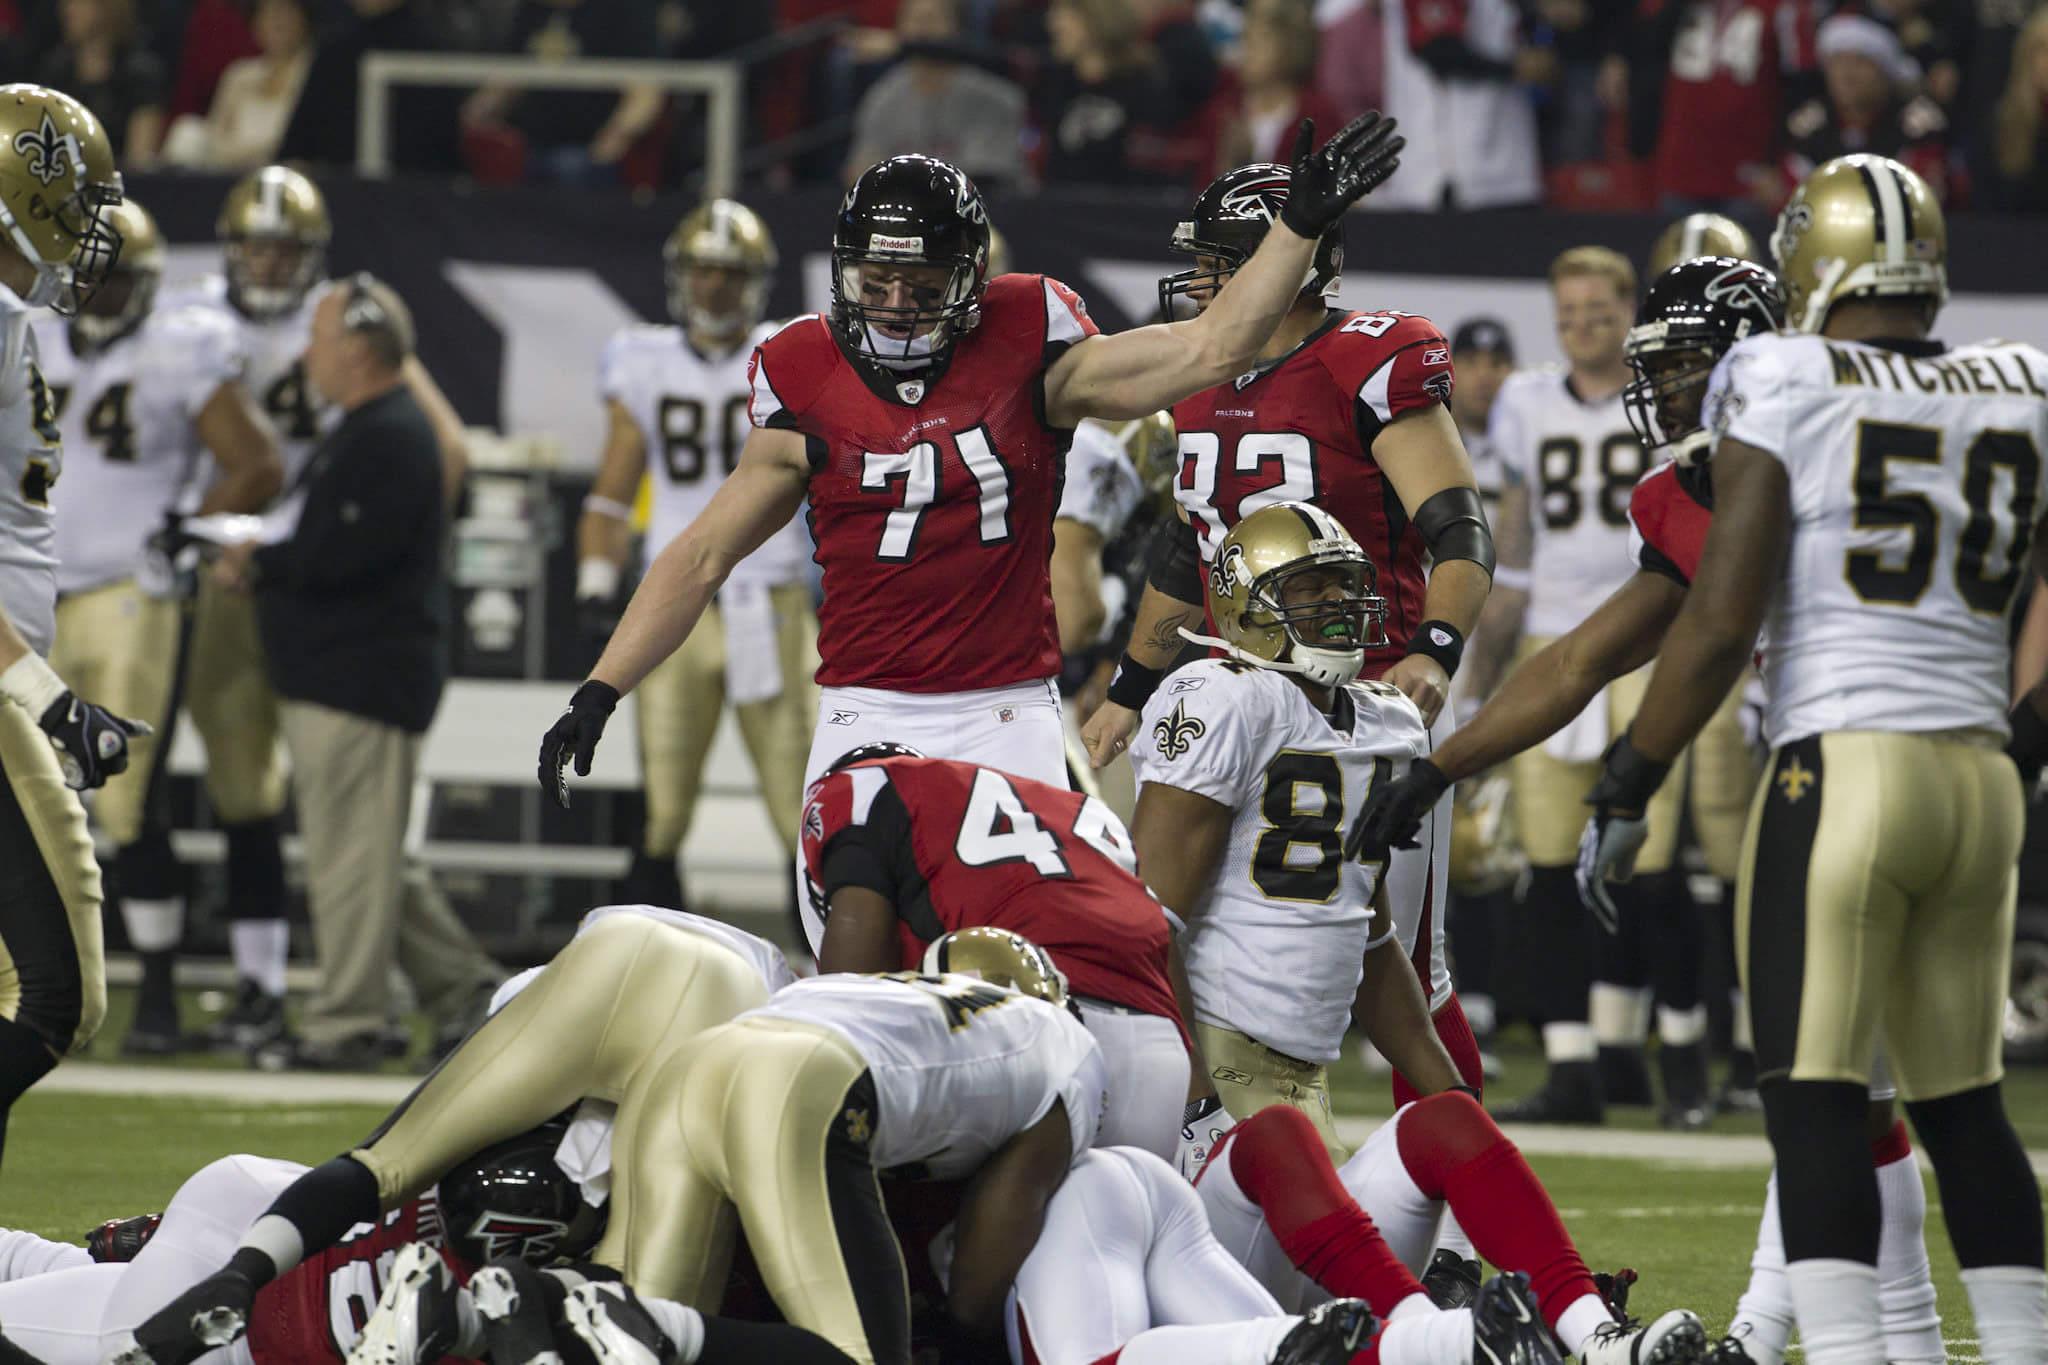 Atlanta Falcons vs New Orleans Saints NFL football rivalry